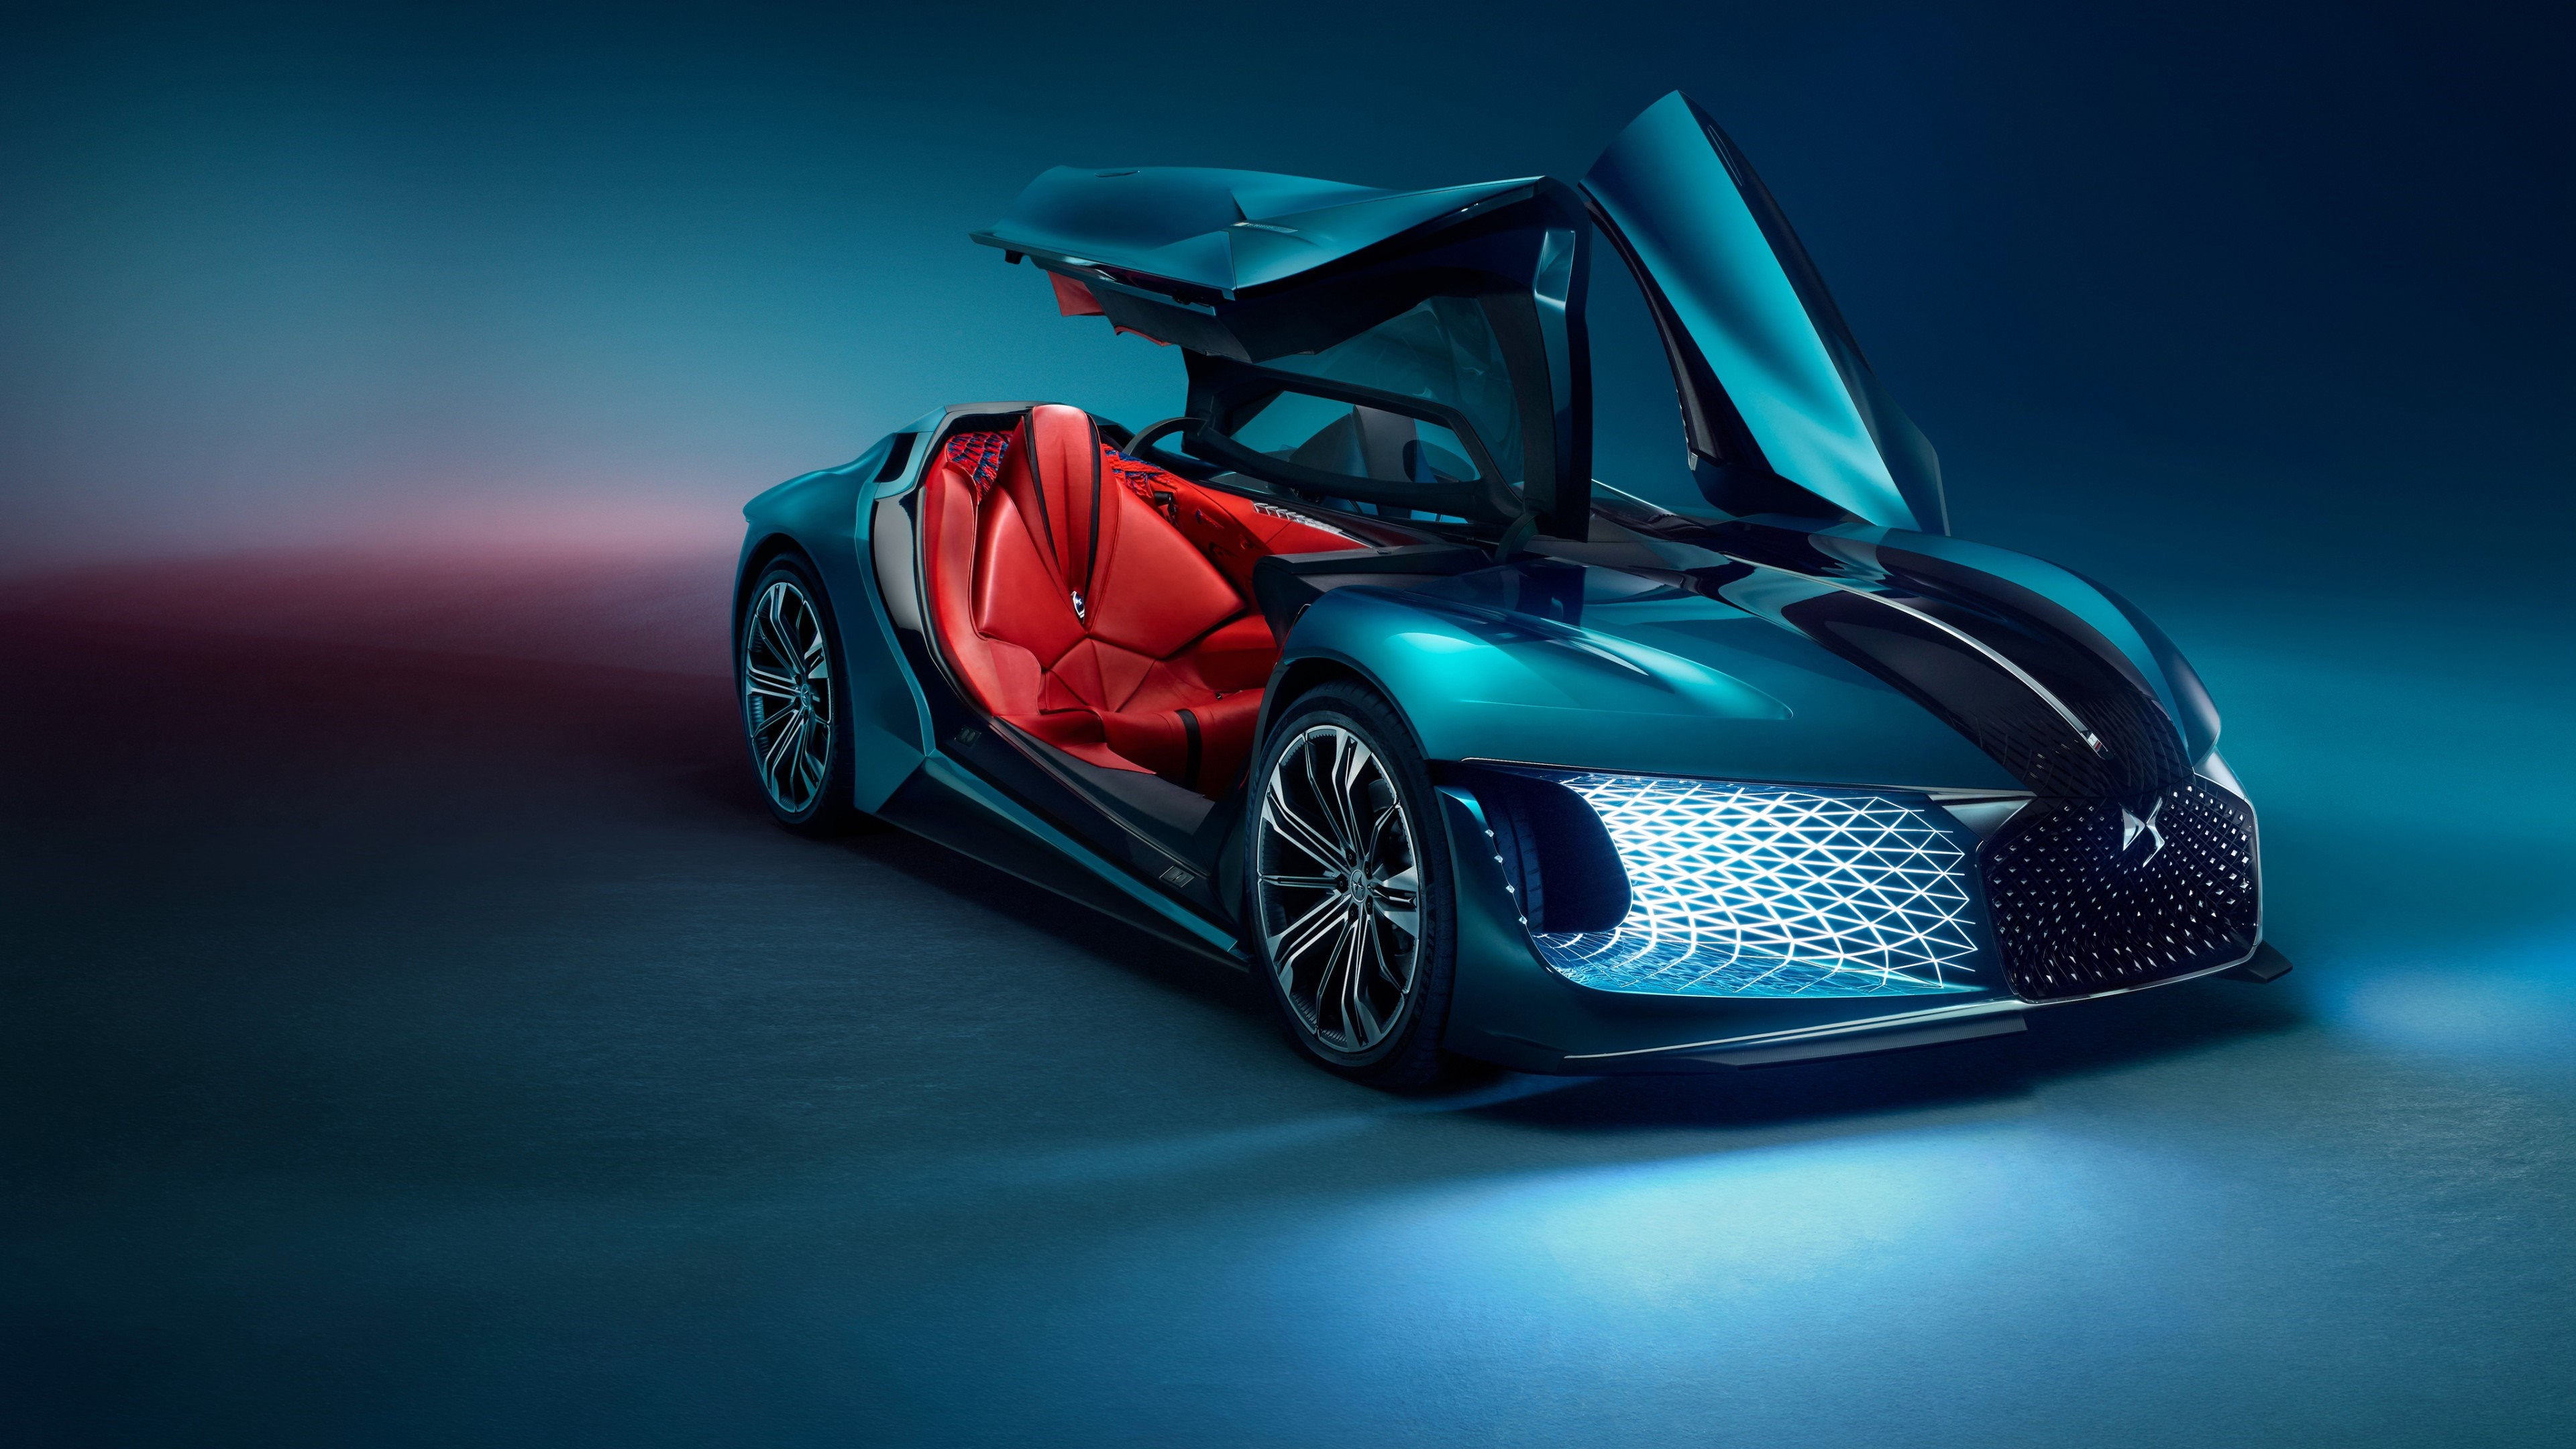 Citroen Ds X E Tense Concept Car 4k Ultrahd Wallpaper Backiee